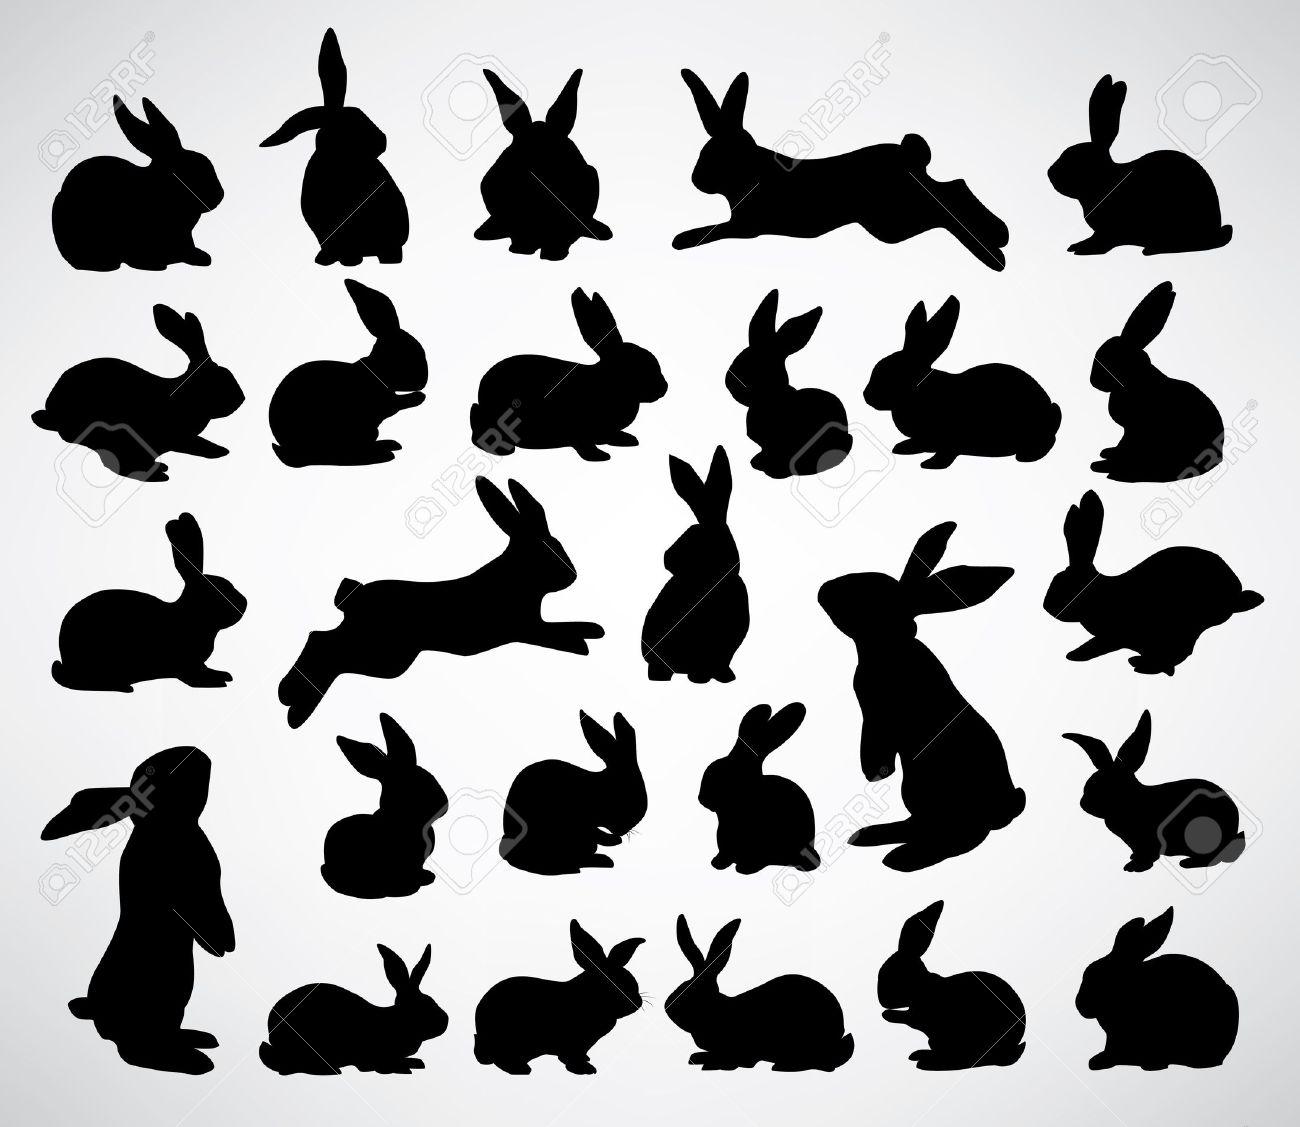 Bunny Head Silhouette Clipart